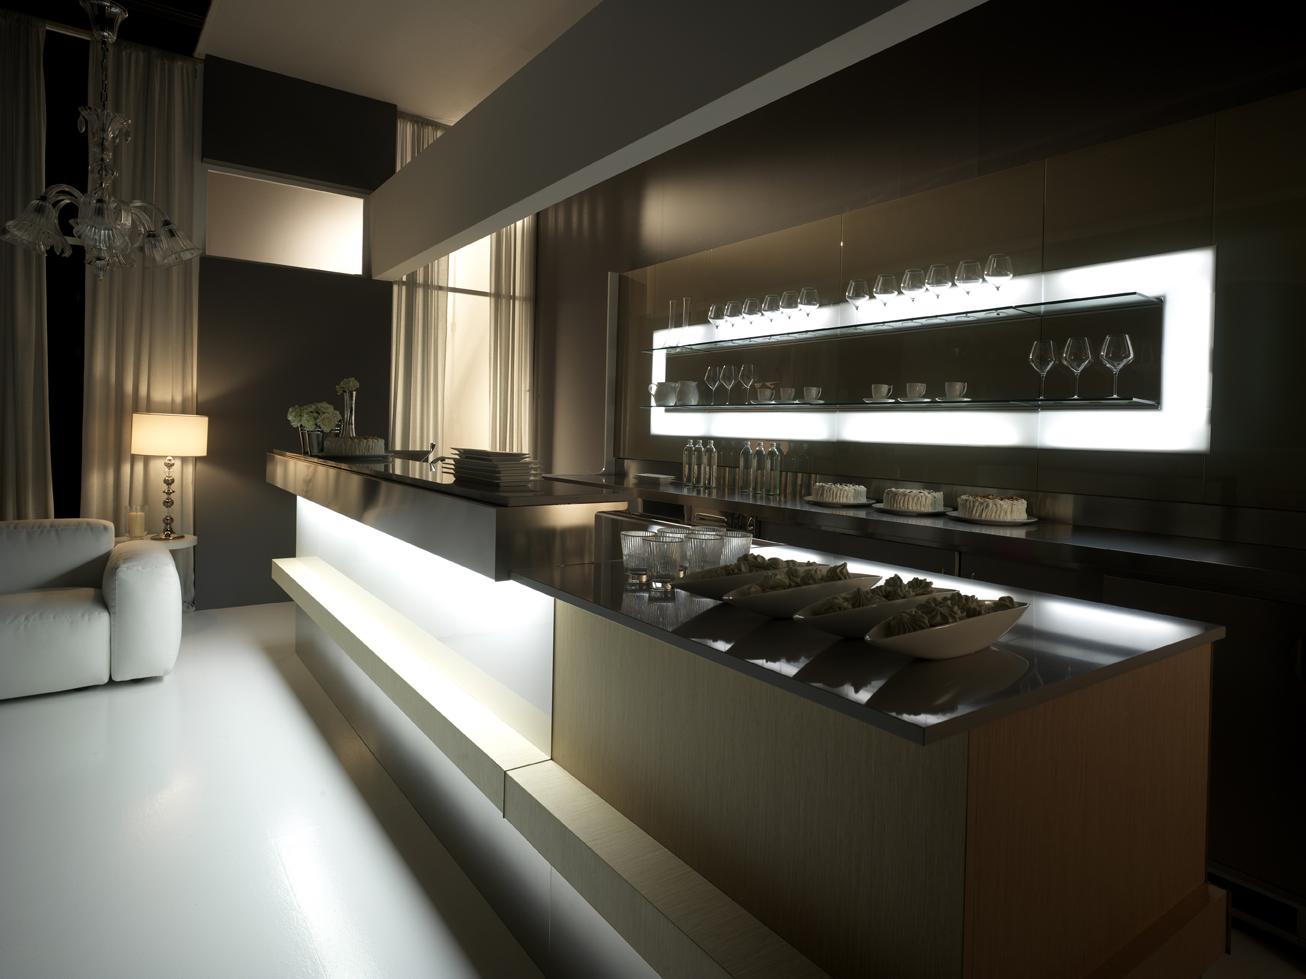 Idee arredamento bar uv01 regardsdefemmes for Arredamenti bar prezzi